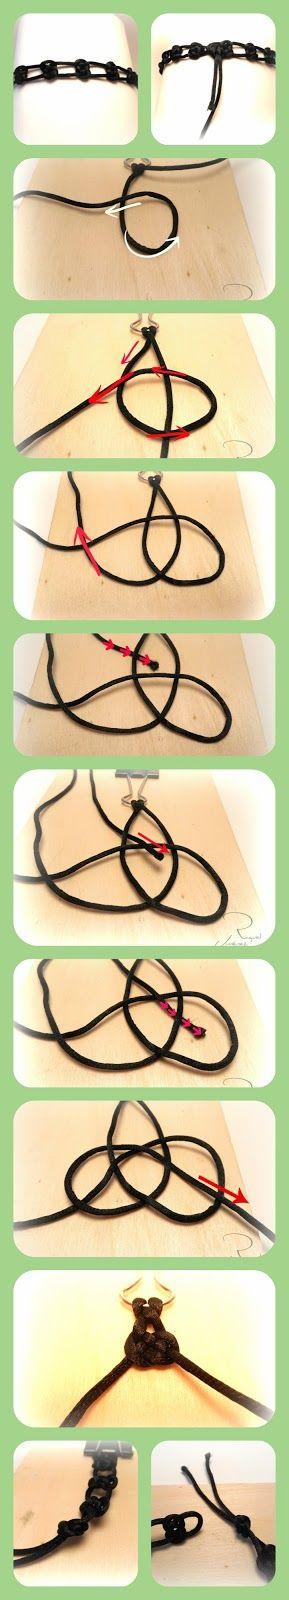 DIY. como hacer un choker con nudo infinito. How to make a choker with infinite knot